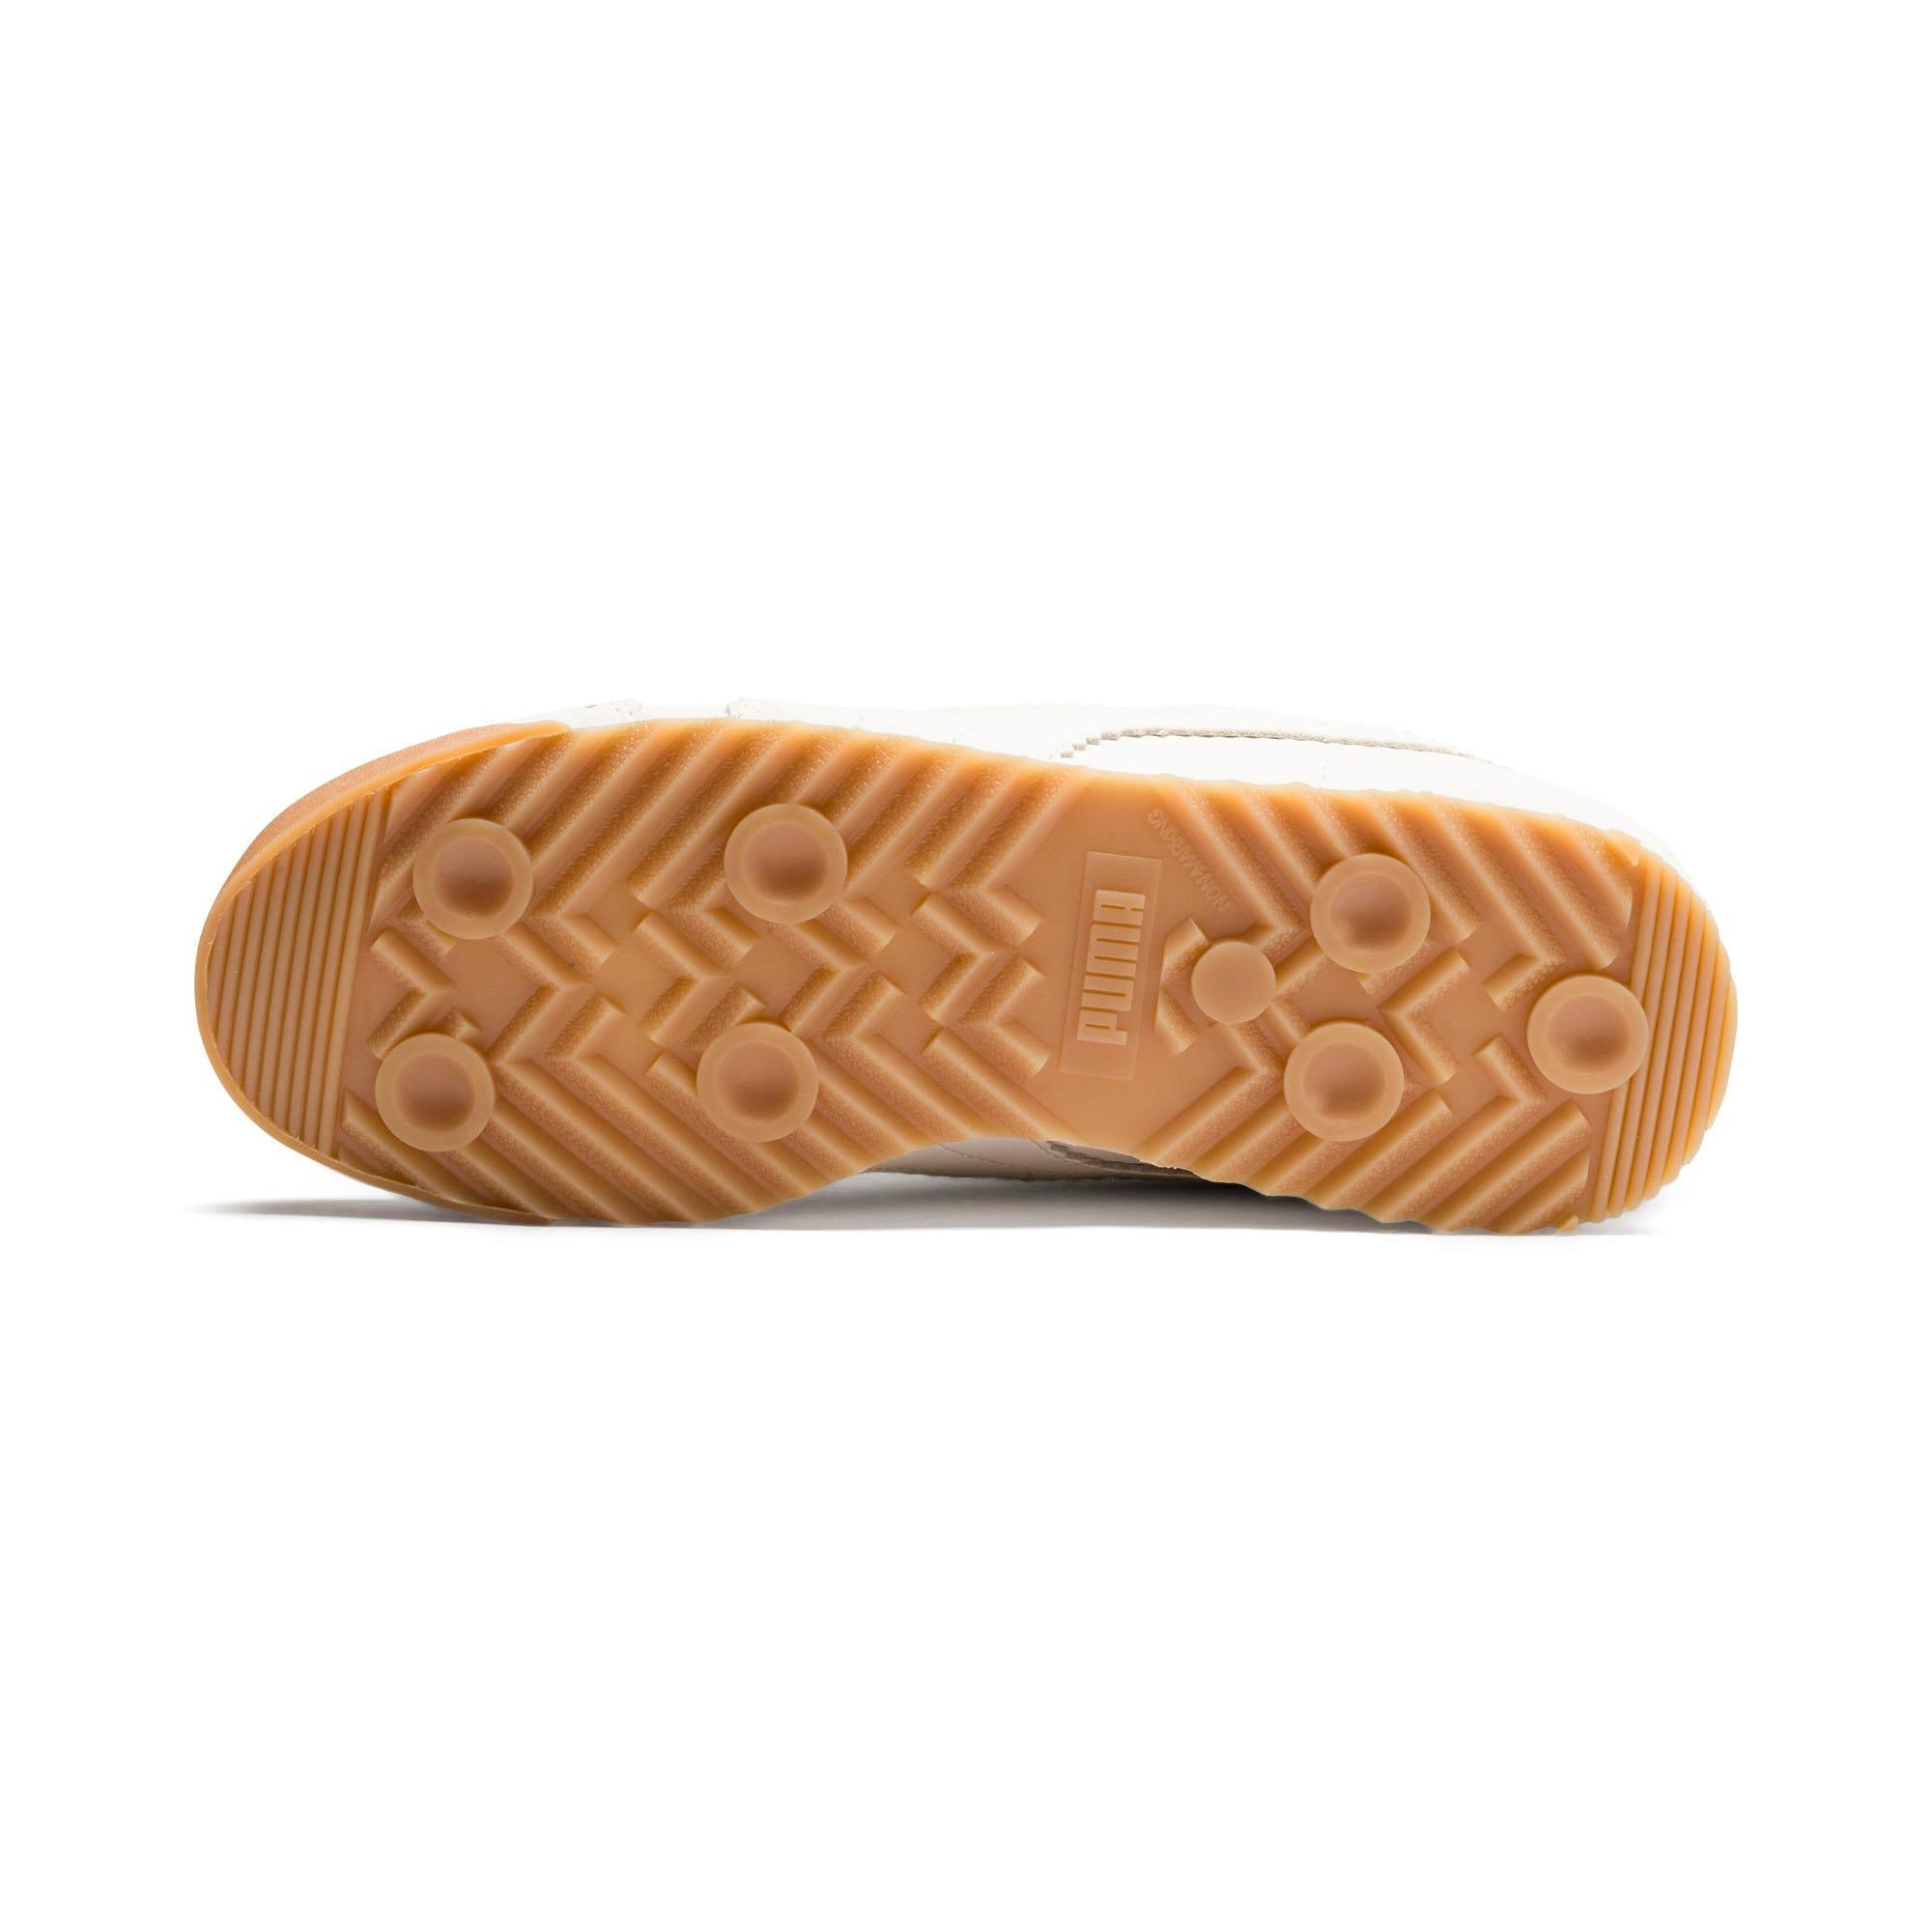 Thumbnail 4 of Roma Brogue Women's Sneakers, Pastel Parchment-P.Team Gold, medium